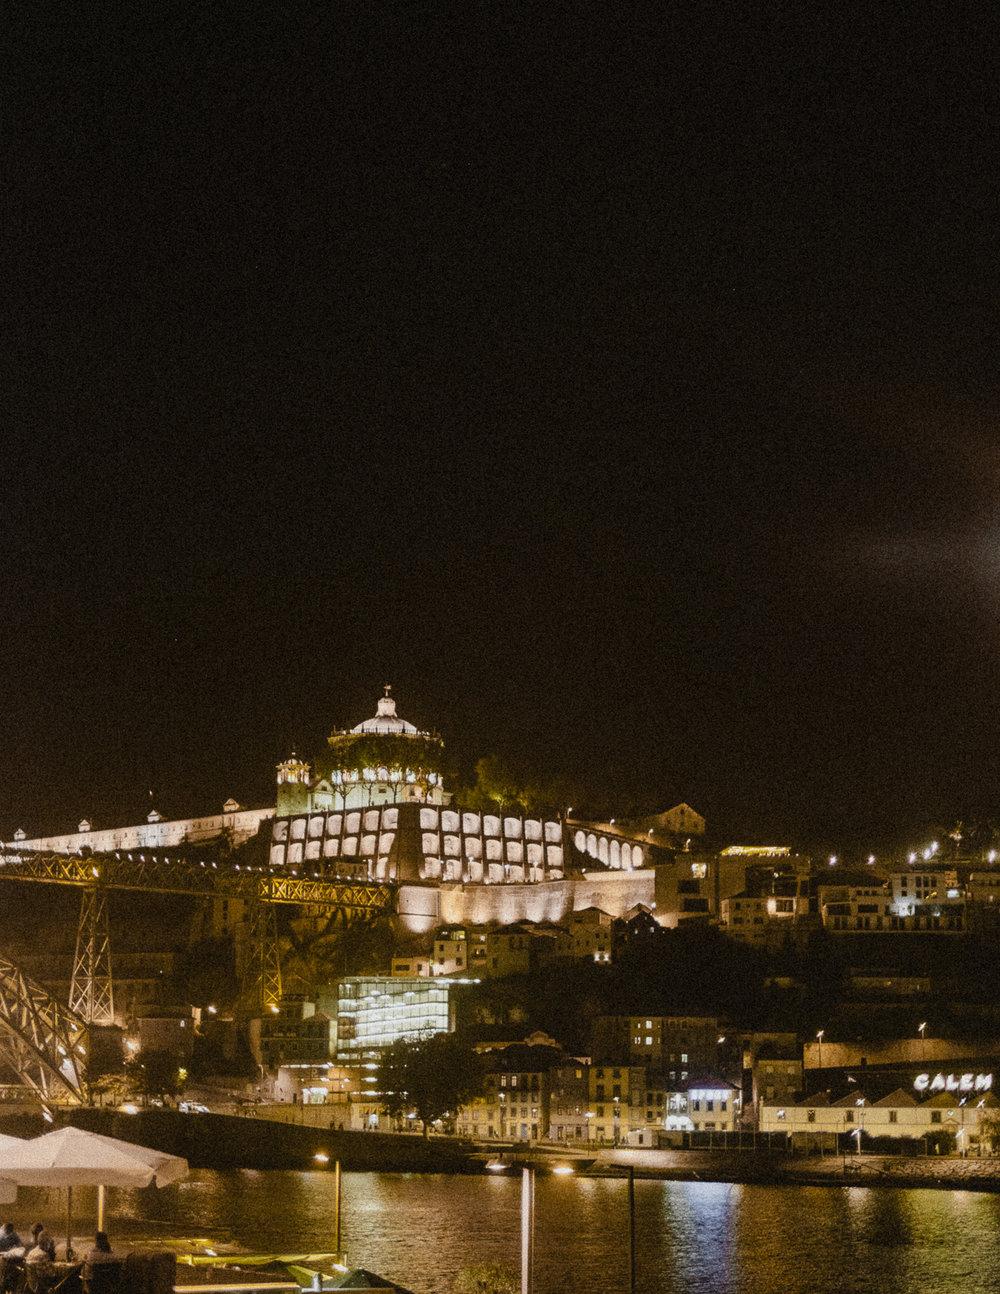 porto-douro-night